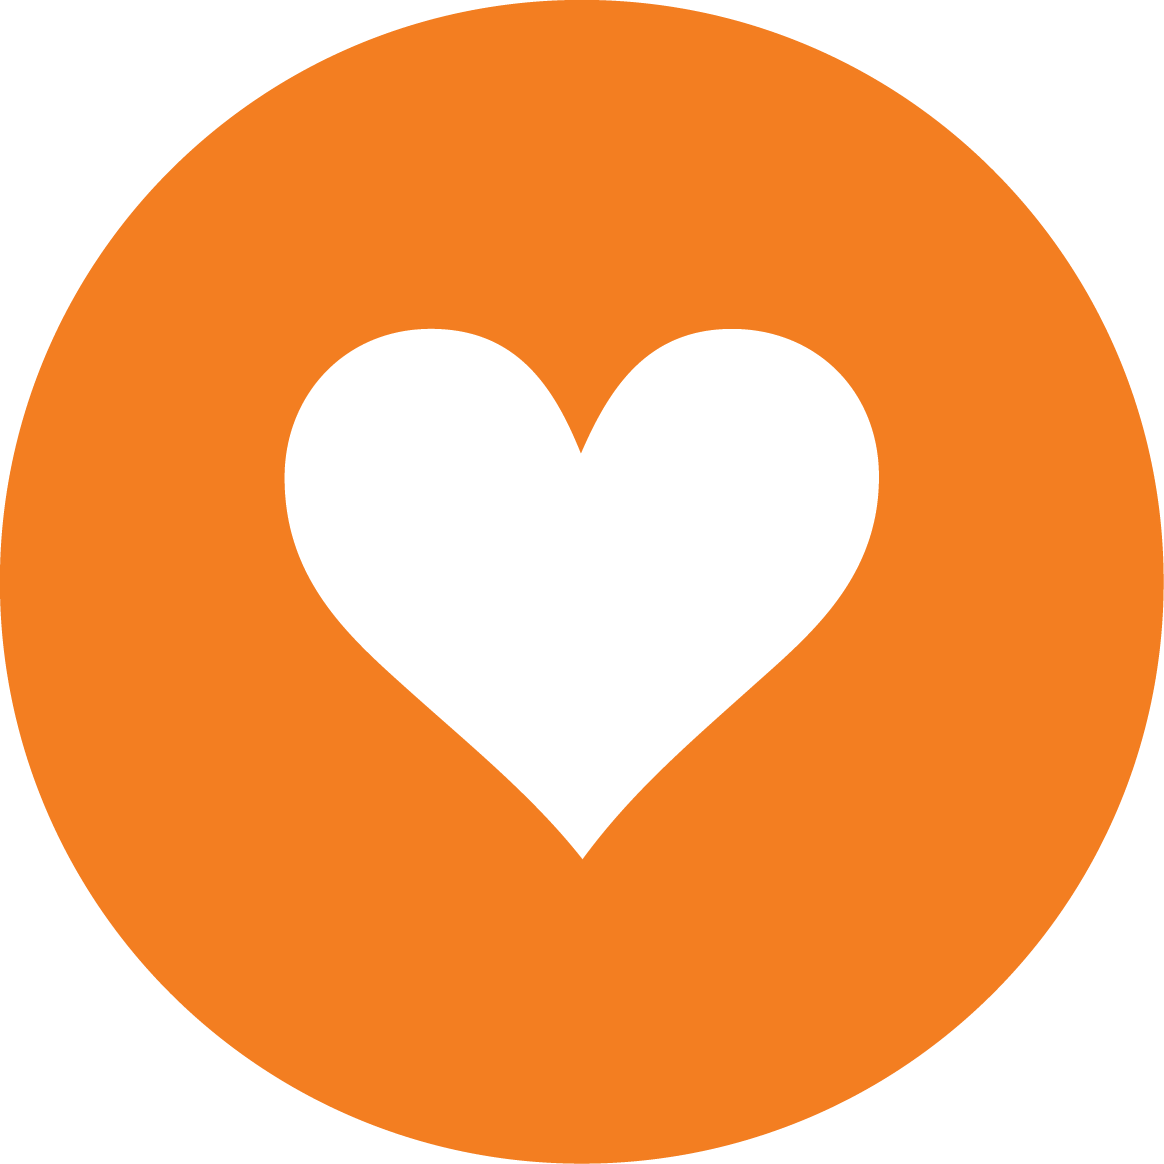 Volunteering clipart volunteer heart. Become an intern or